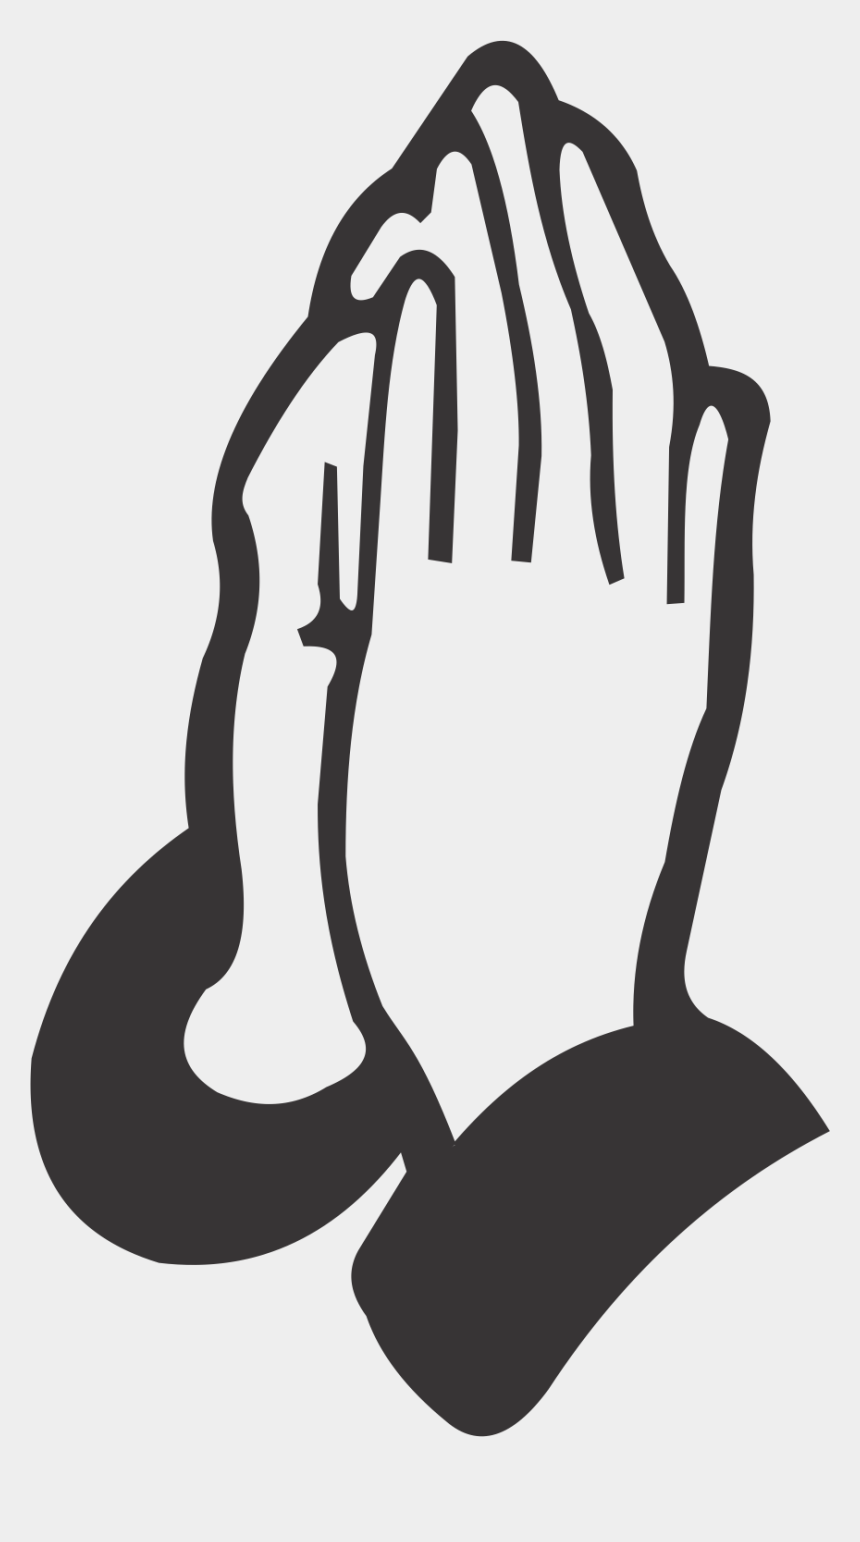 praying hands clipart, Cartoons - Image Of Praying Hands